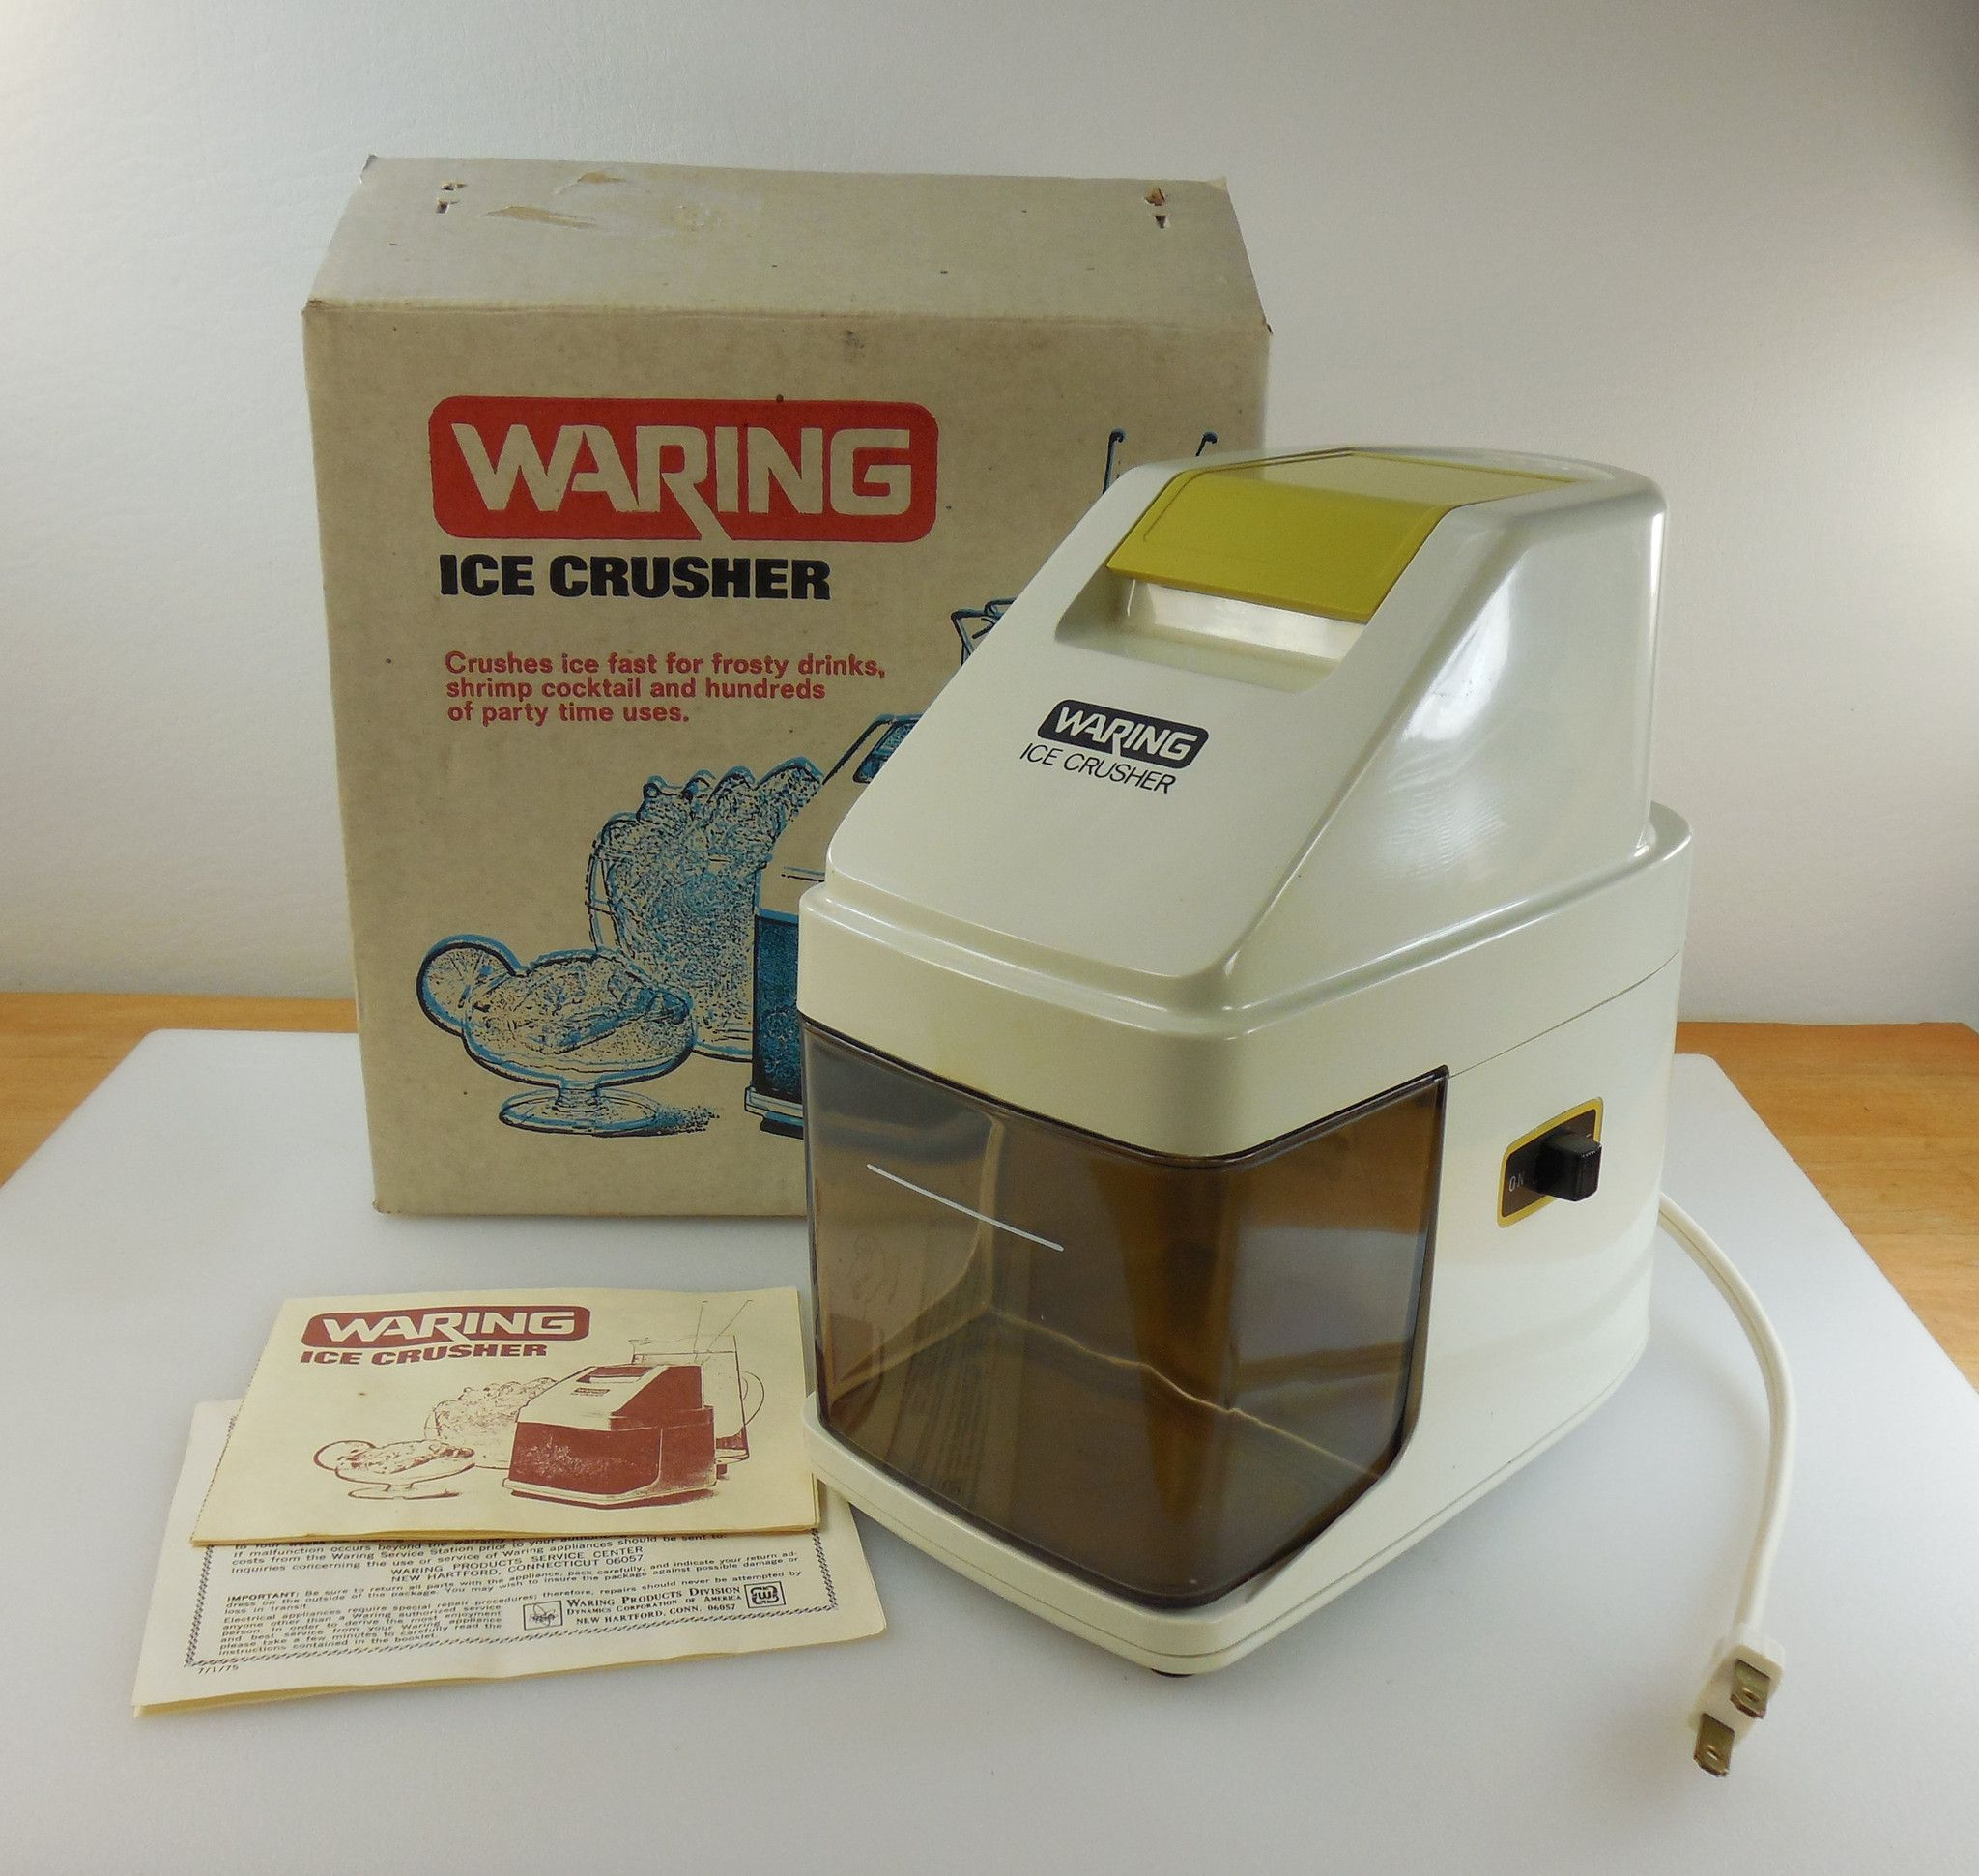 waring 1970s unused ice crusher kitchen bar electric appliance   original box  u0026 papers waring 1970s unused ice crusher kitchen bar electric appliance      rh   pinterest com